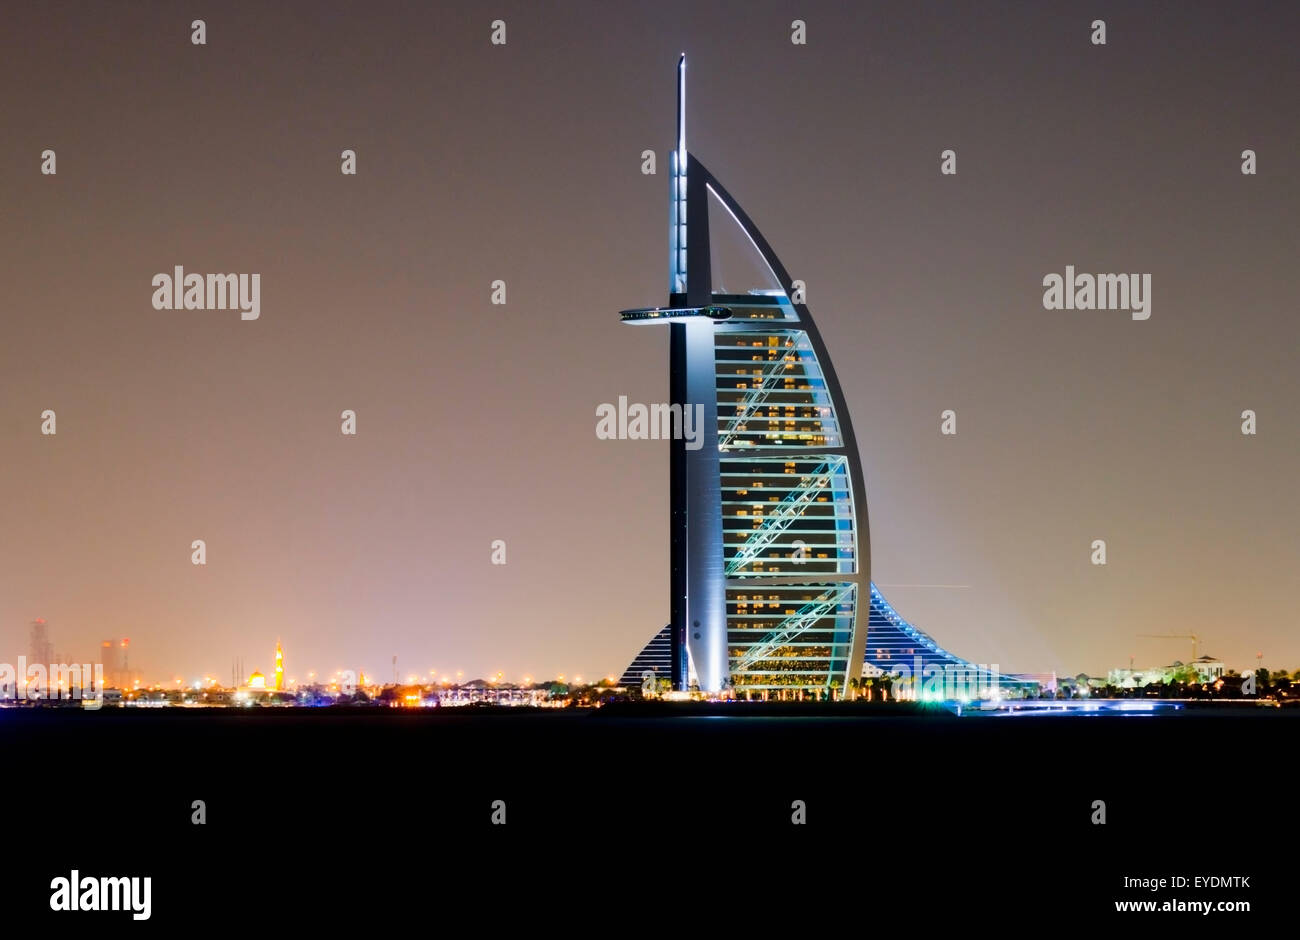 United Arab Emirates, View of Burj al Arab Hotel at dusk; Dubai - Stock Image